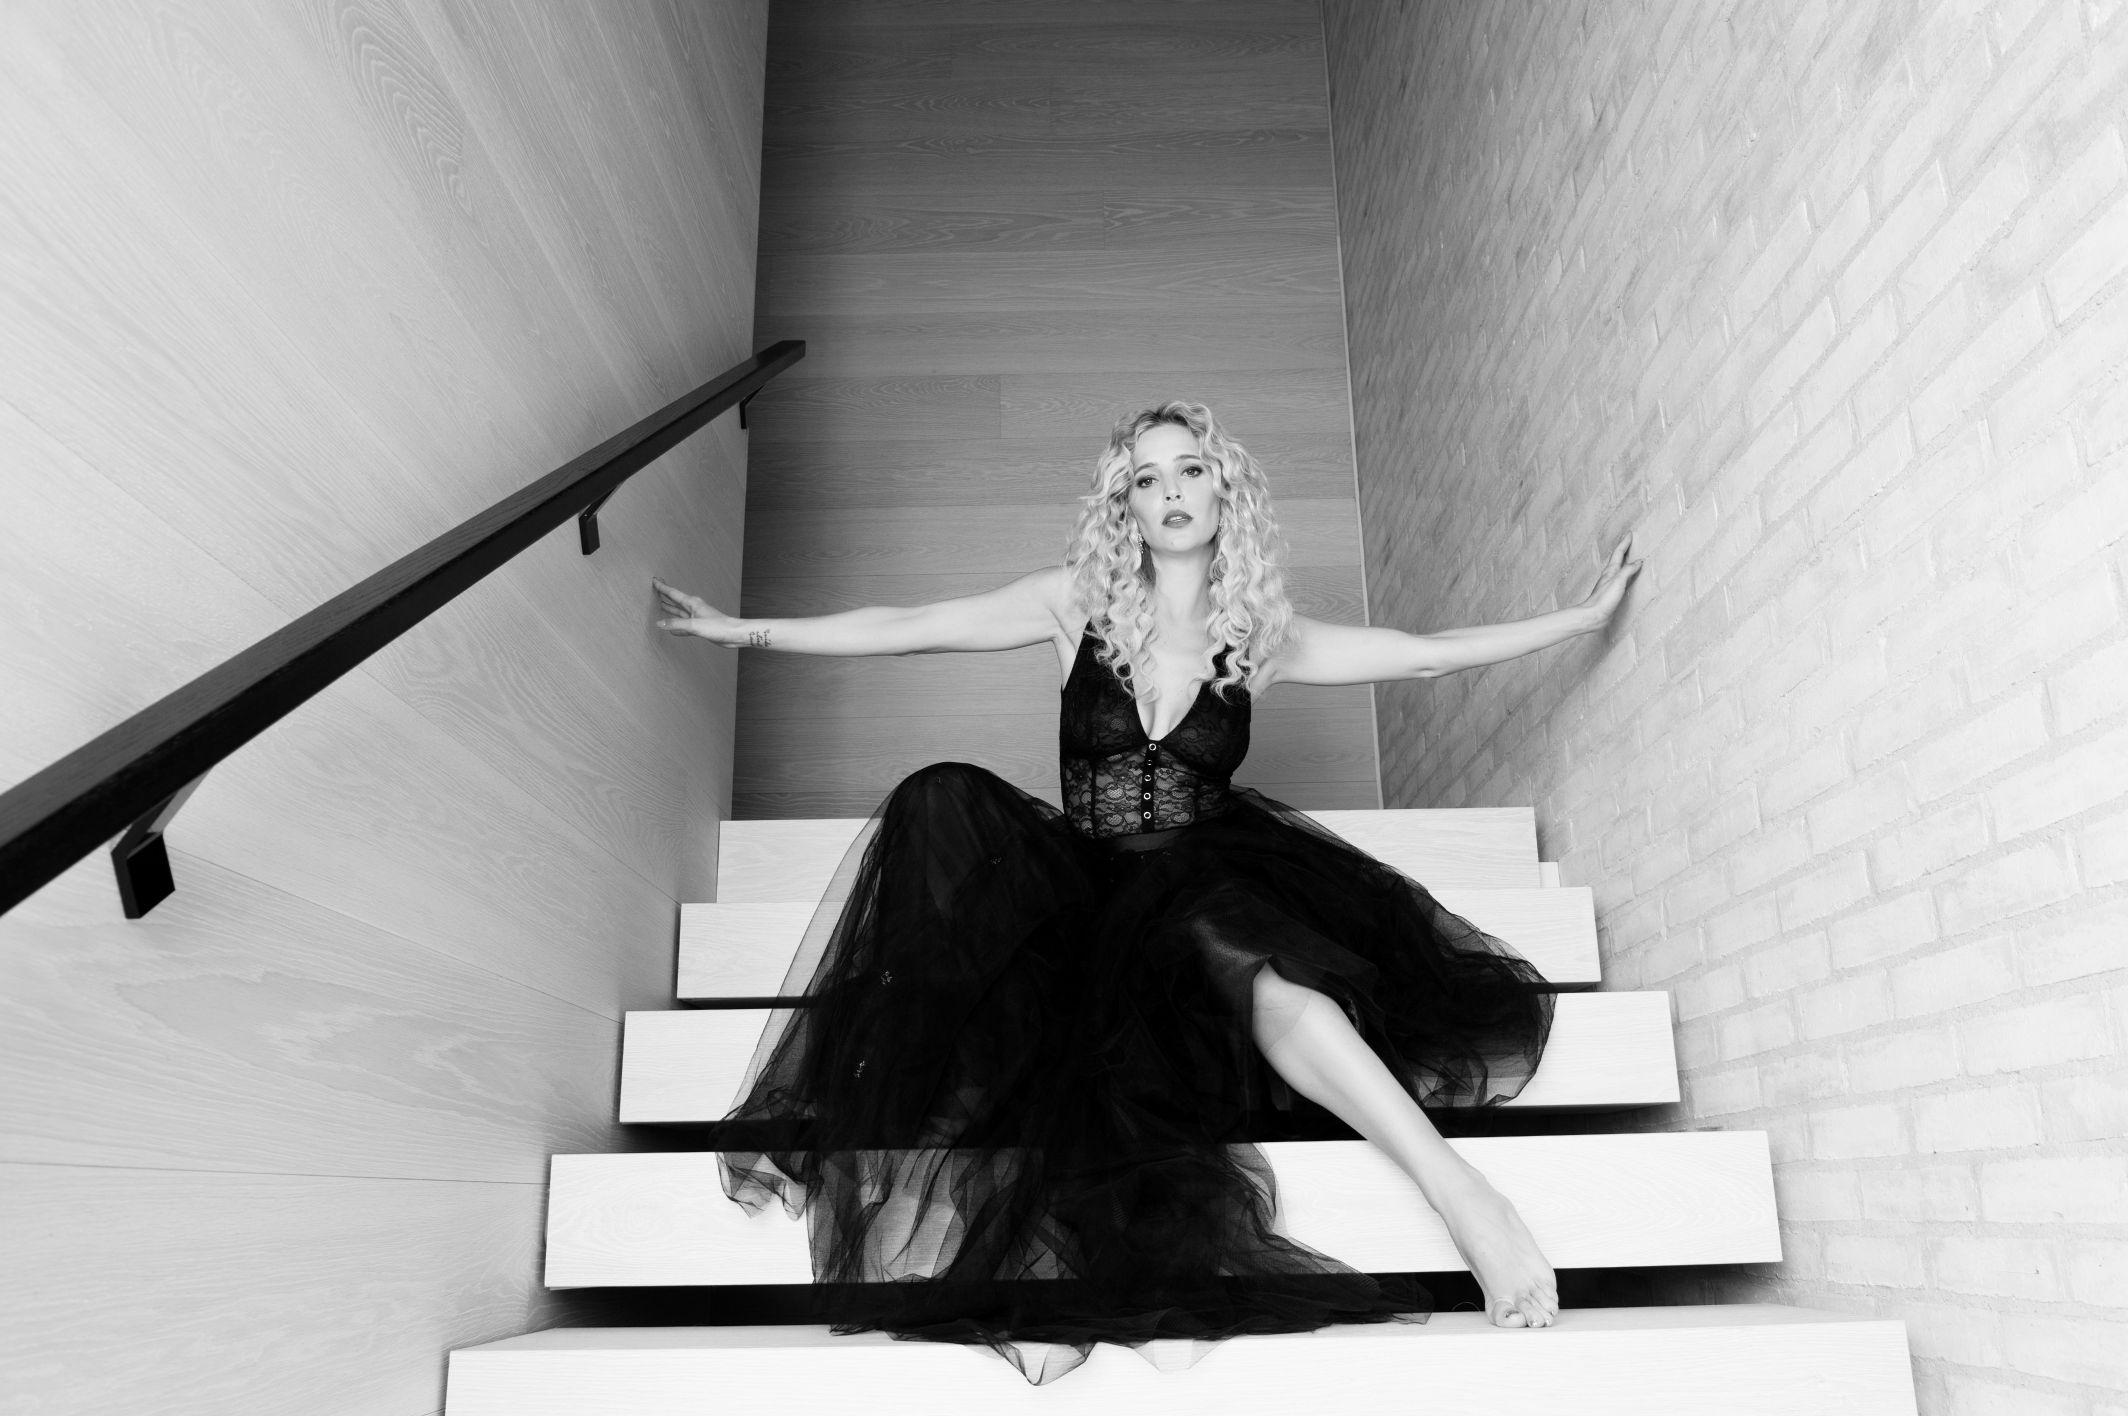 black and whit portrait luisana lopilatio famous actress